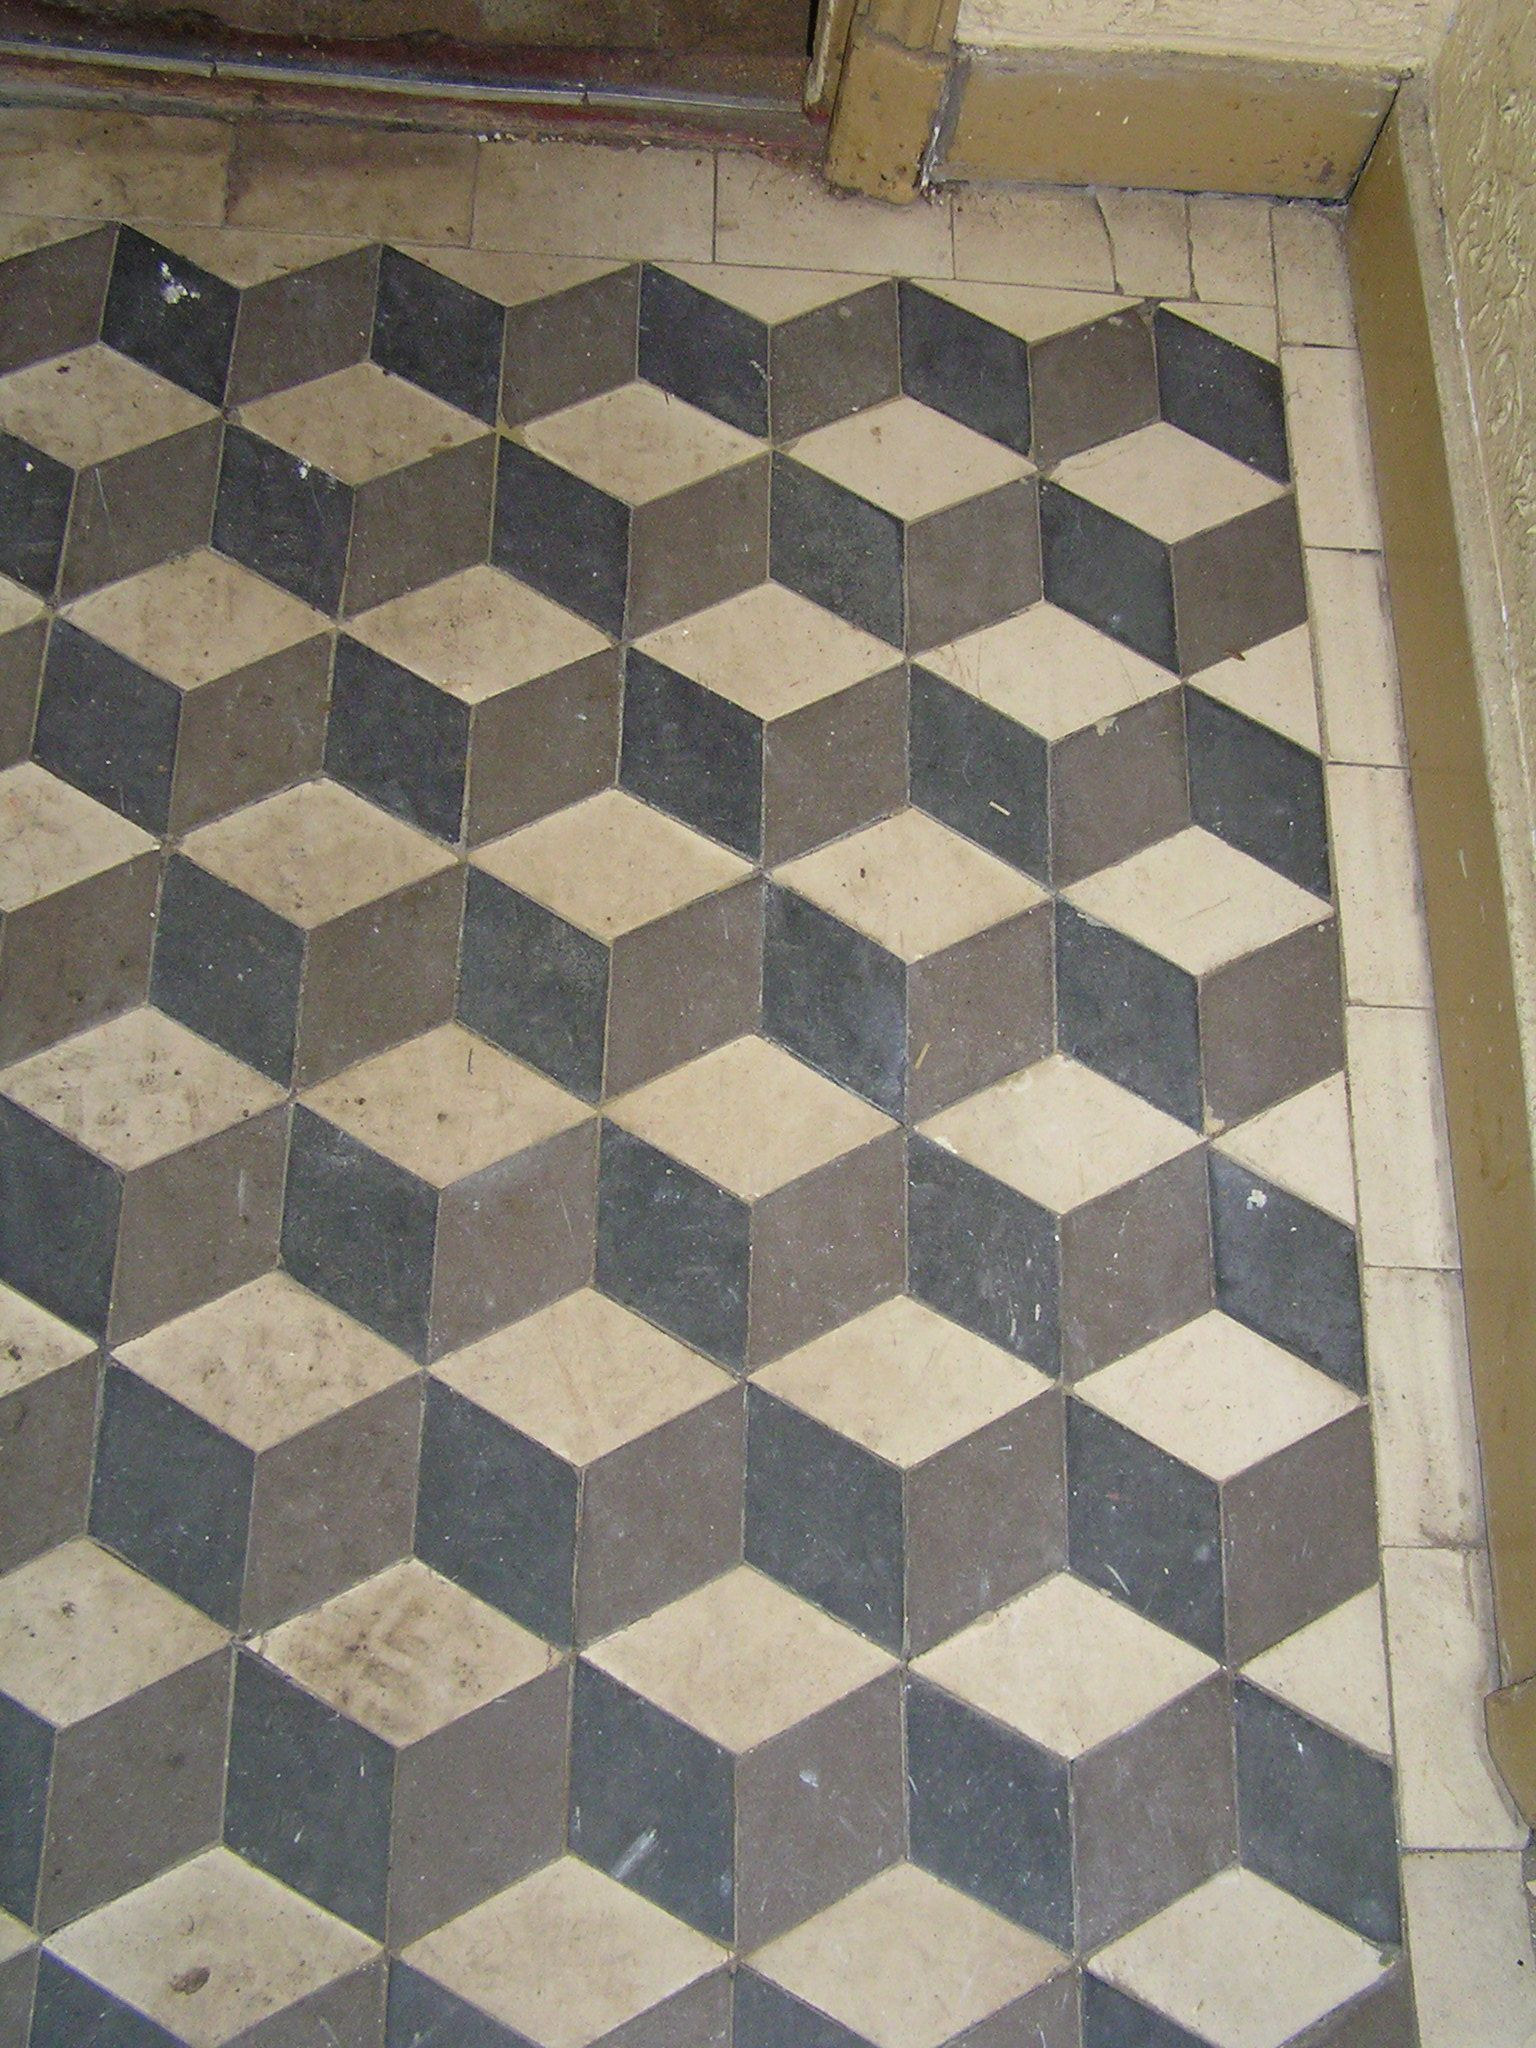 Tiles escher print alfred regout 1920 bathroom ideas pinterest tiles escher print alfred regout 1920 dailygadgetfo Gallery